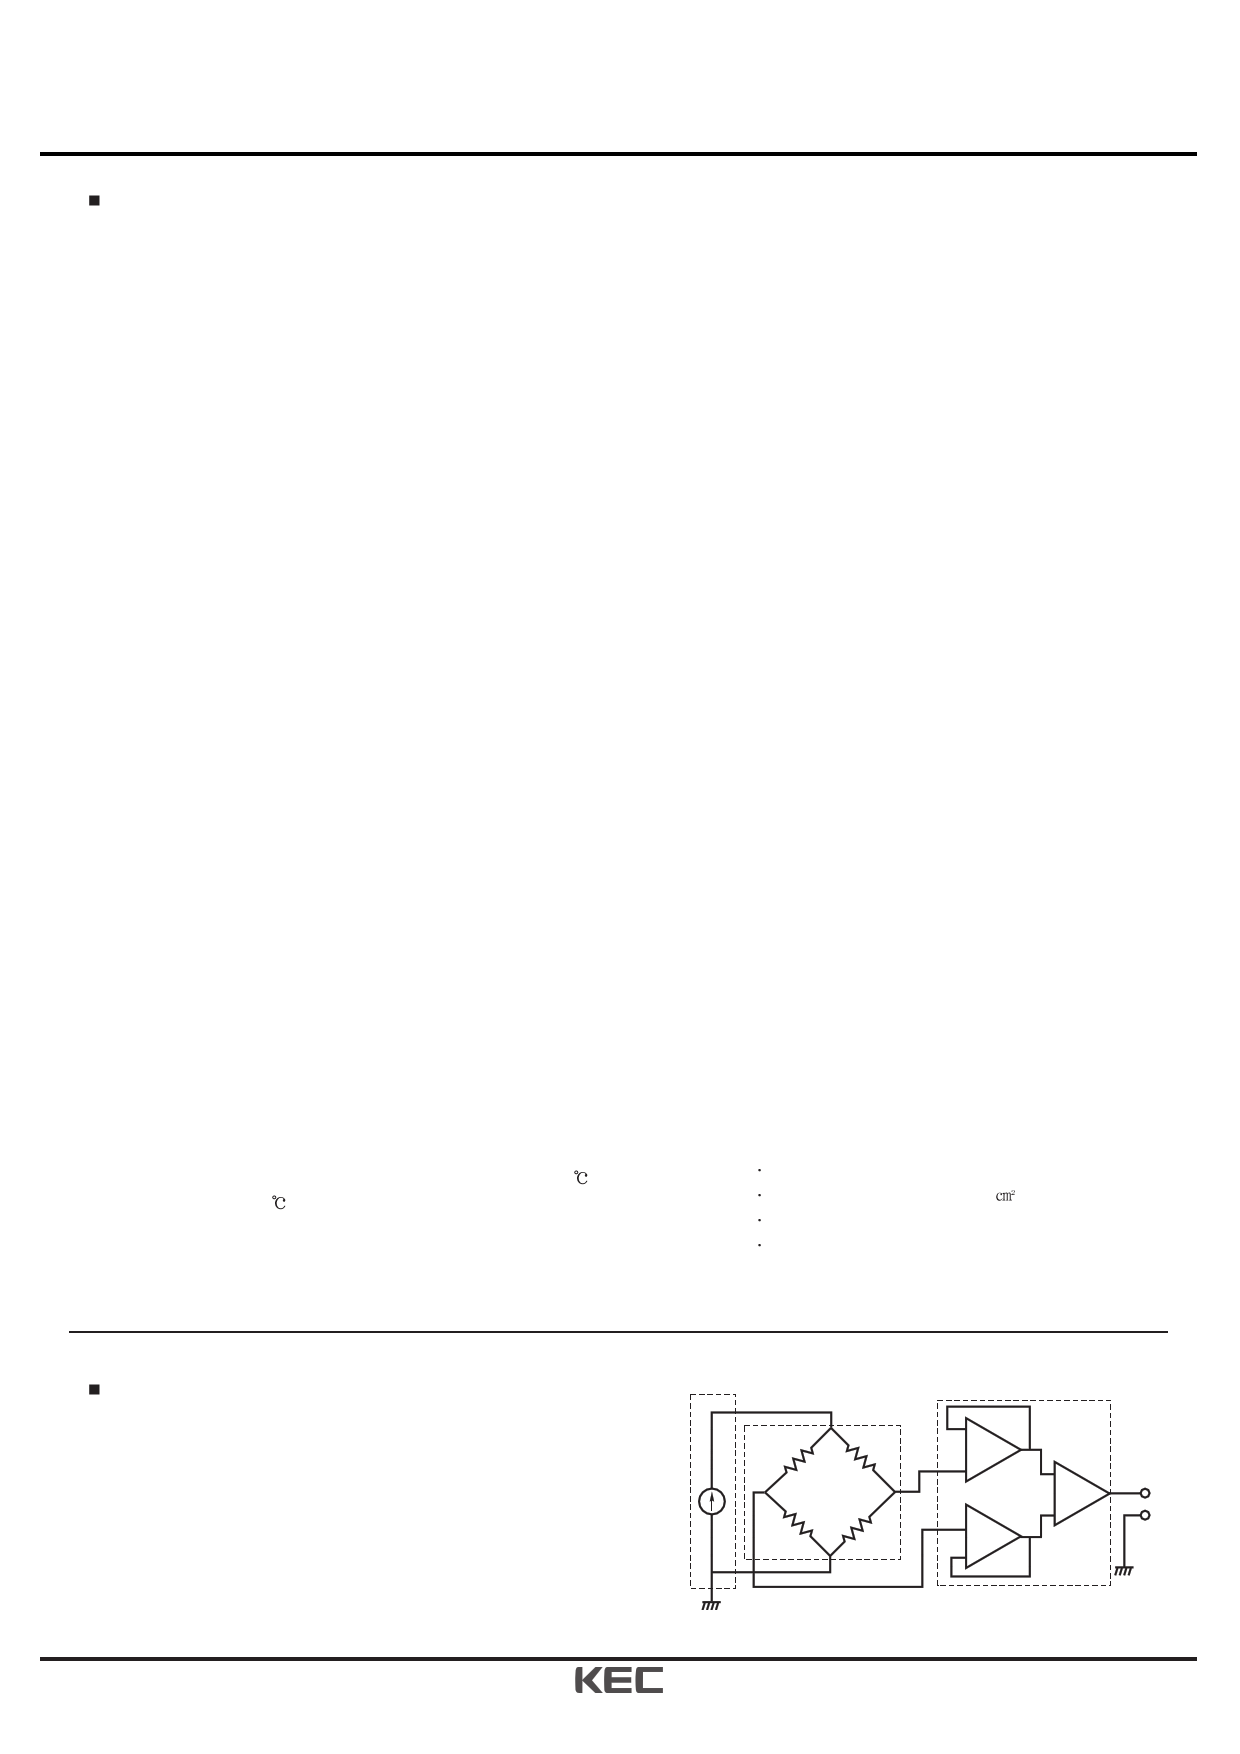 KPF801G02 pdf, 반도체, 판매, 대치품